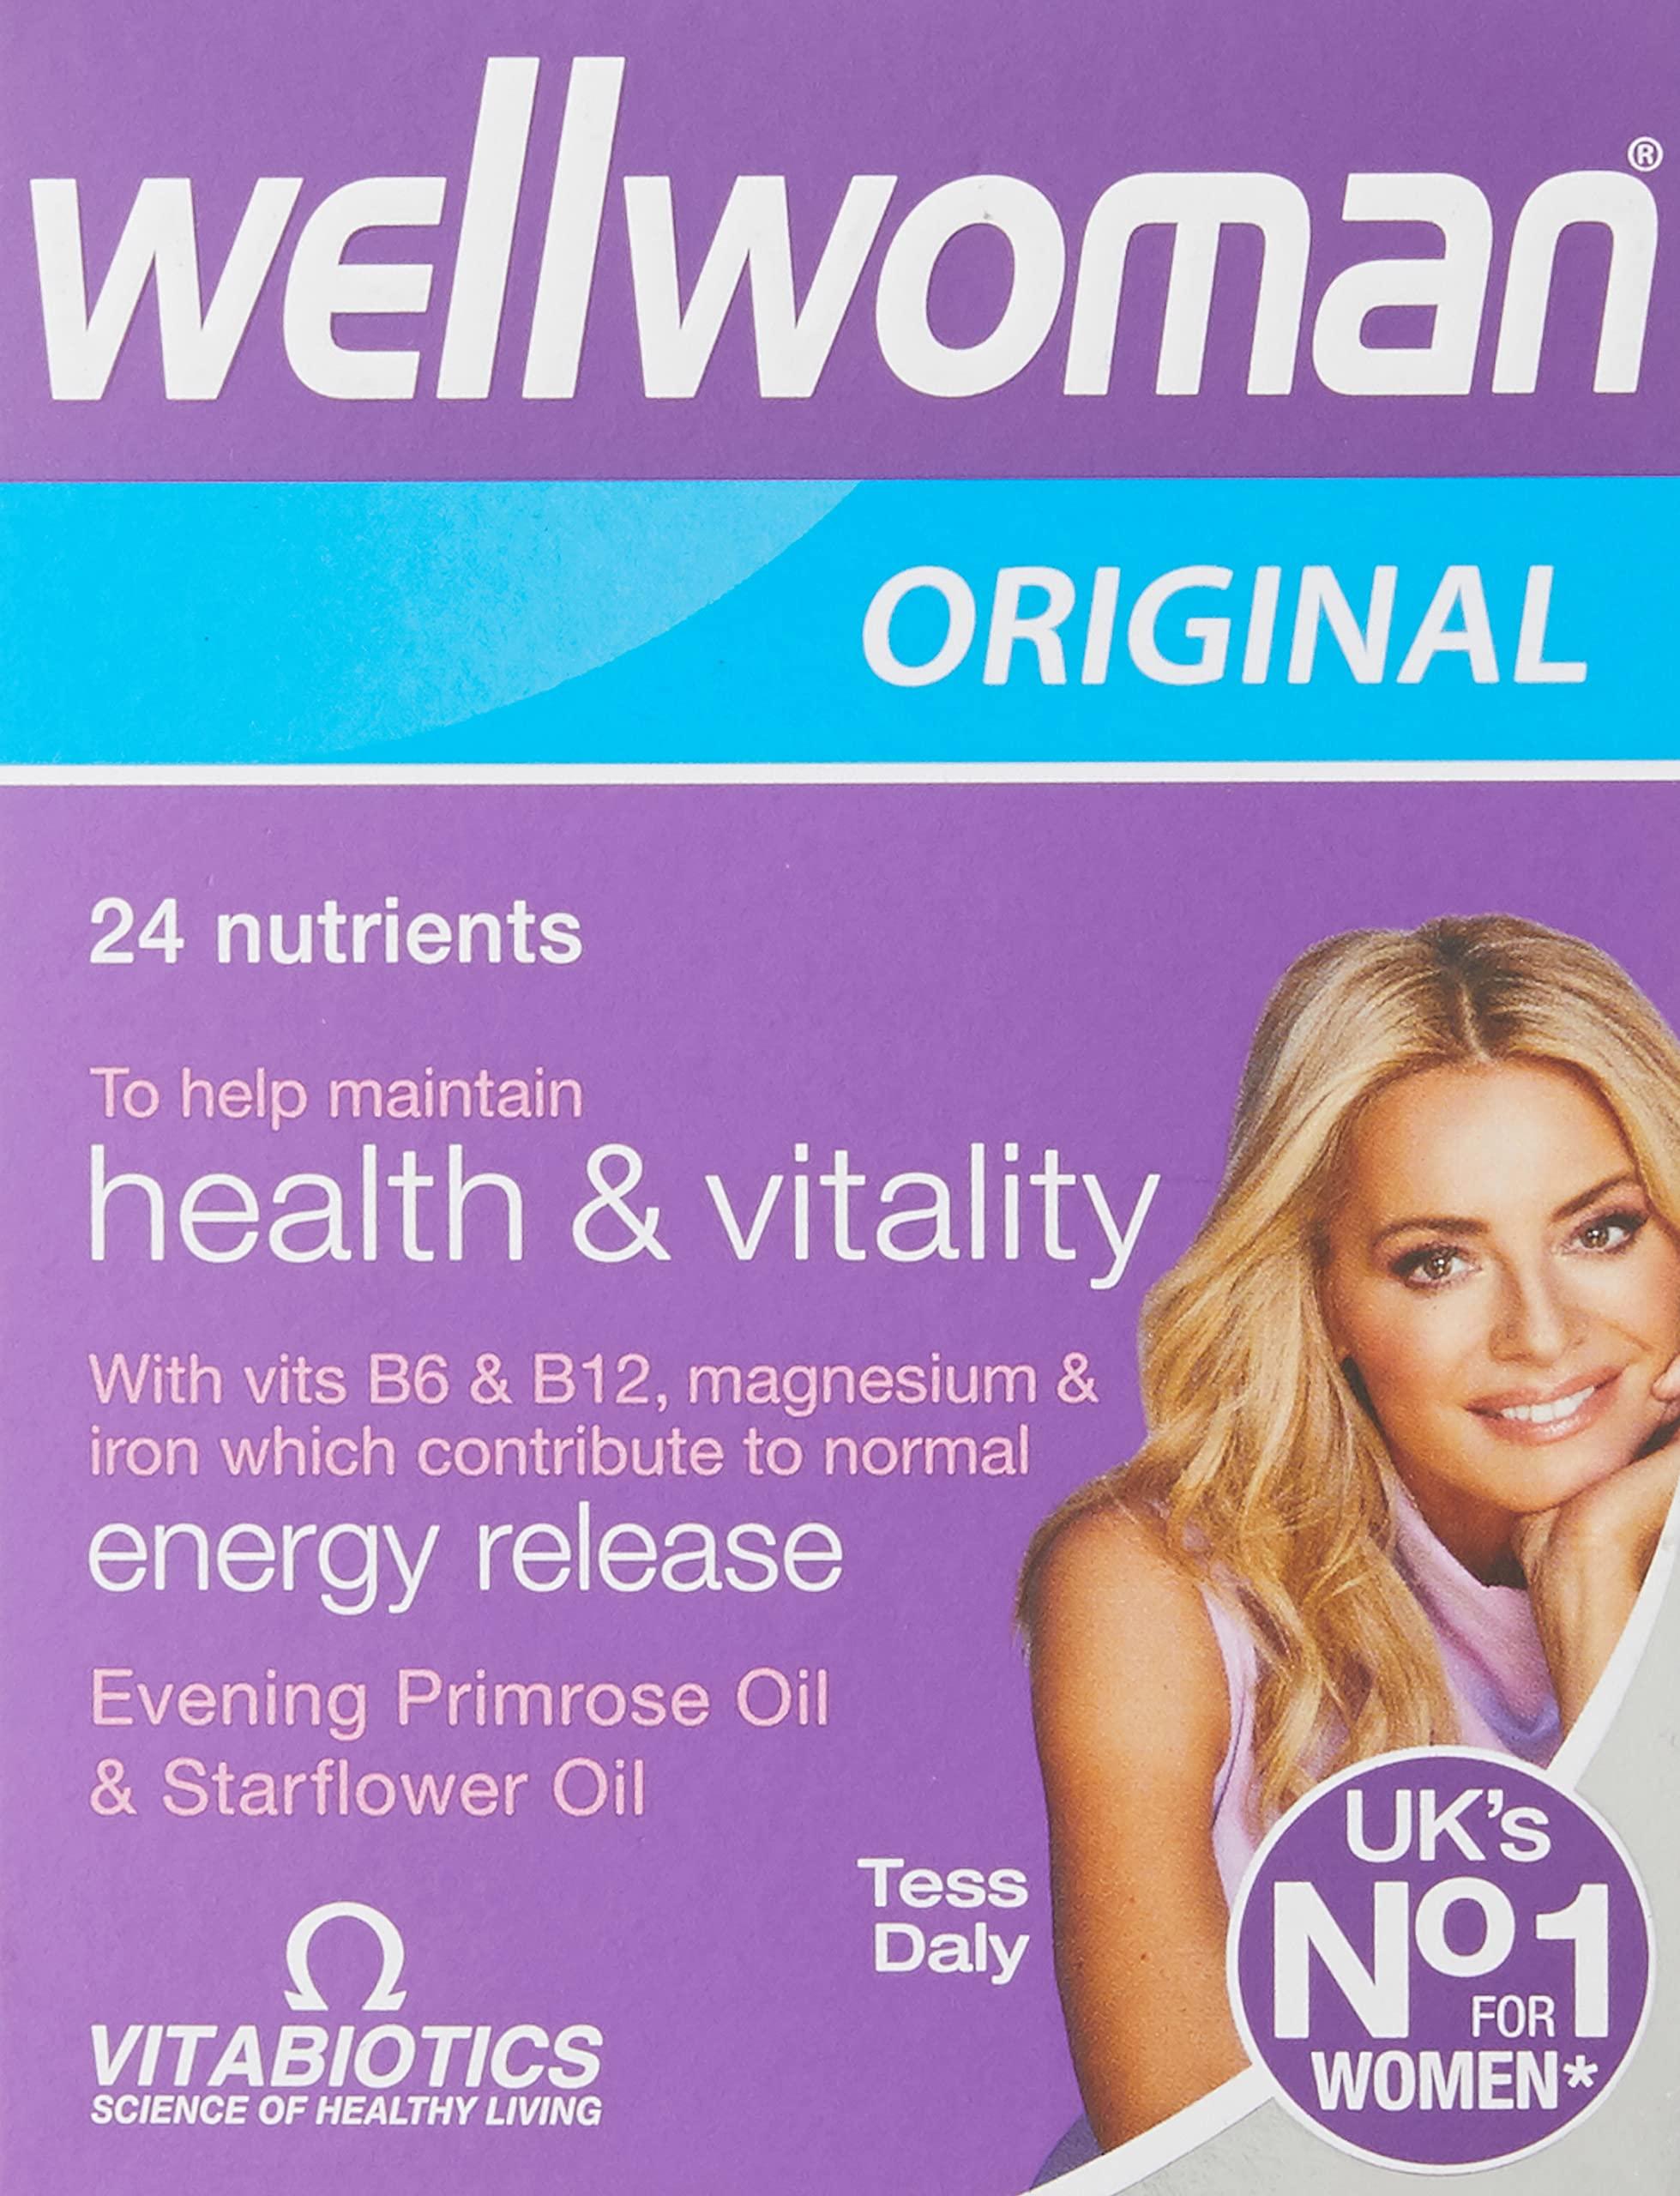 Wellwoman Vitabiotics Advanced Vitamin & Mineral Formula with Evening Primrose & Starflower Oils 30 Capsules